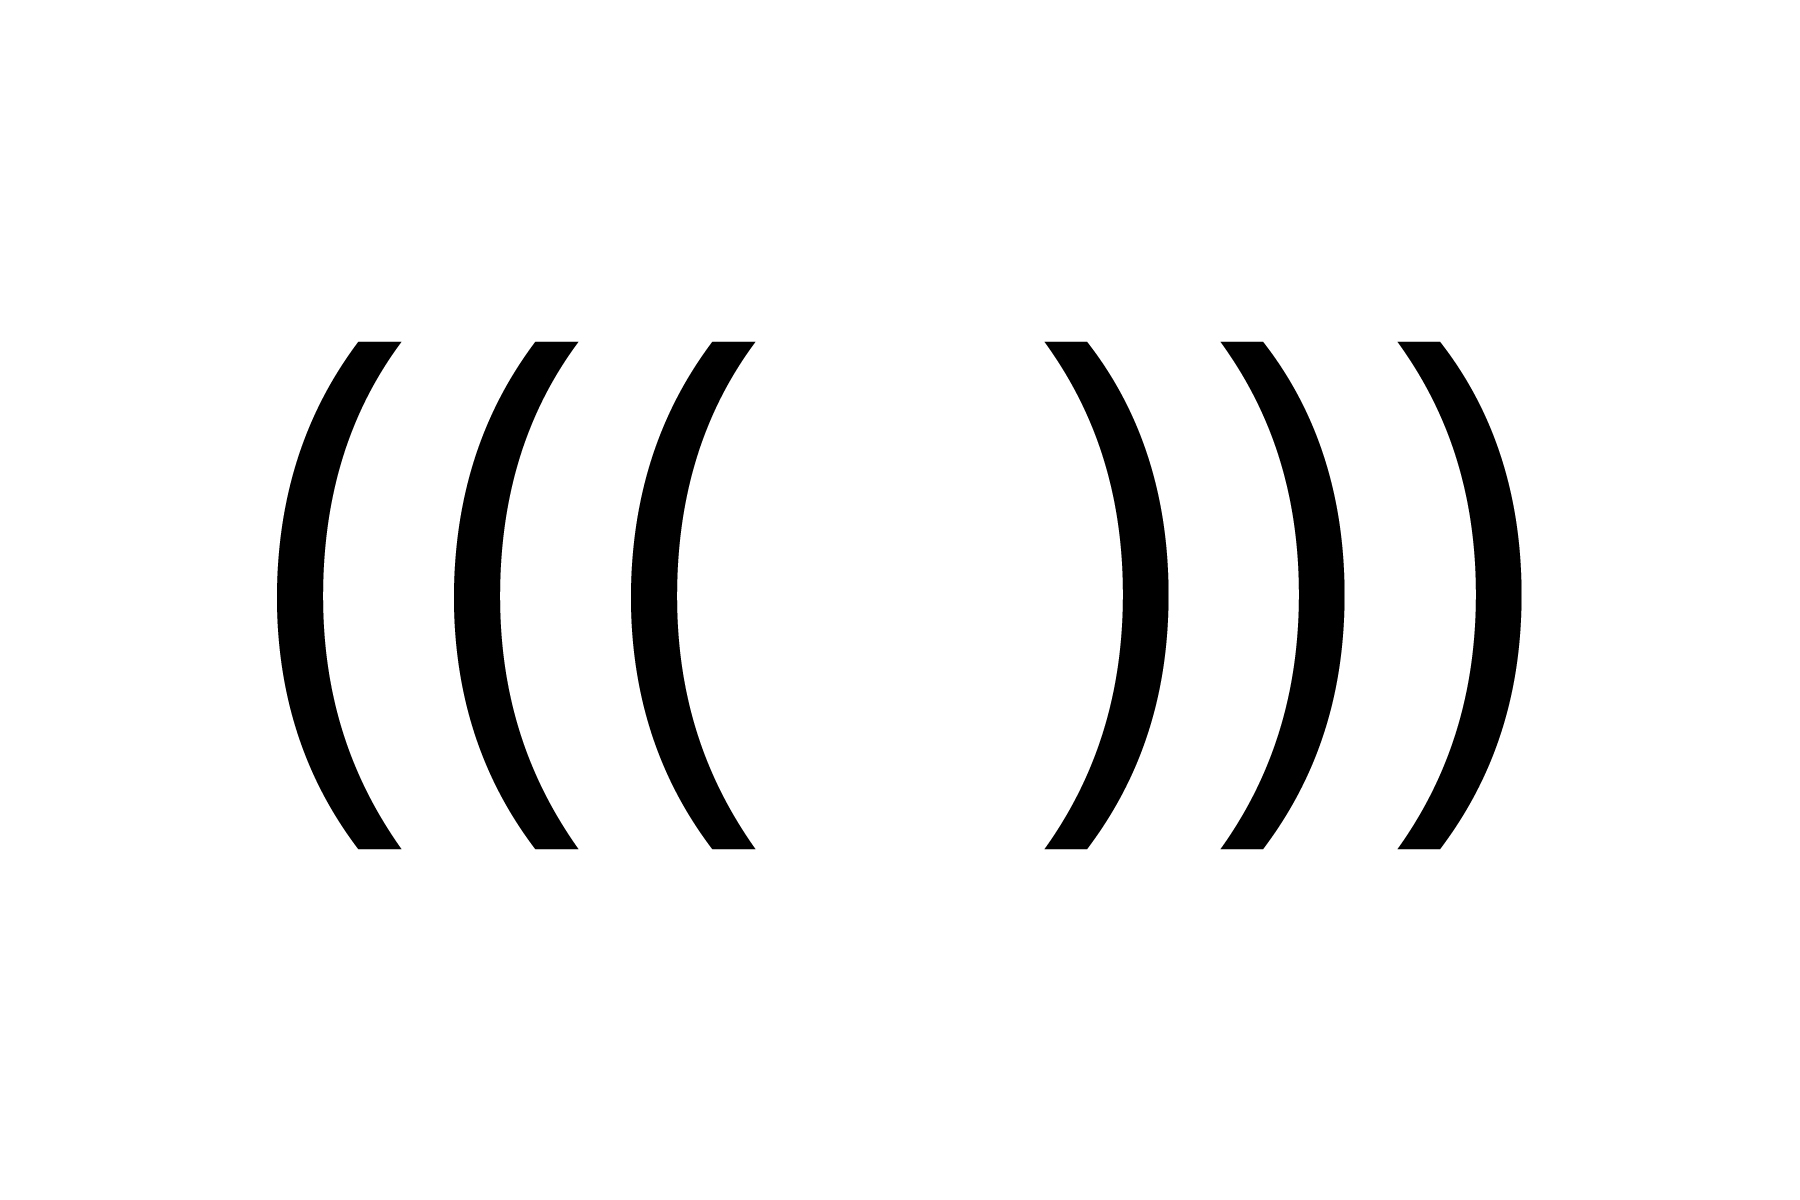 The echo symbol. (Here & Now)